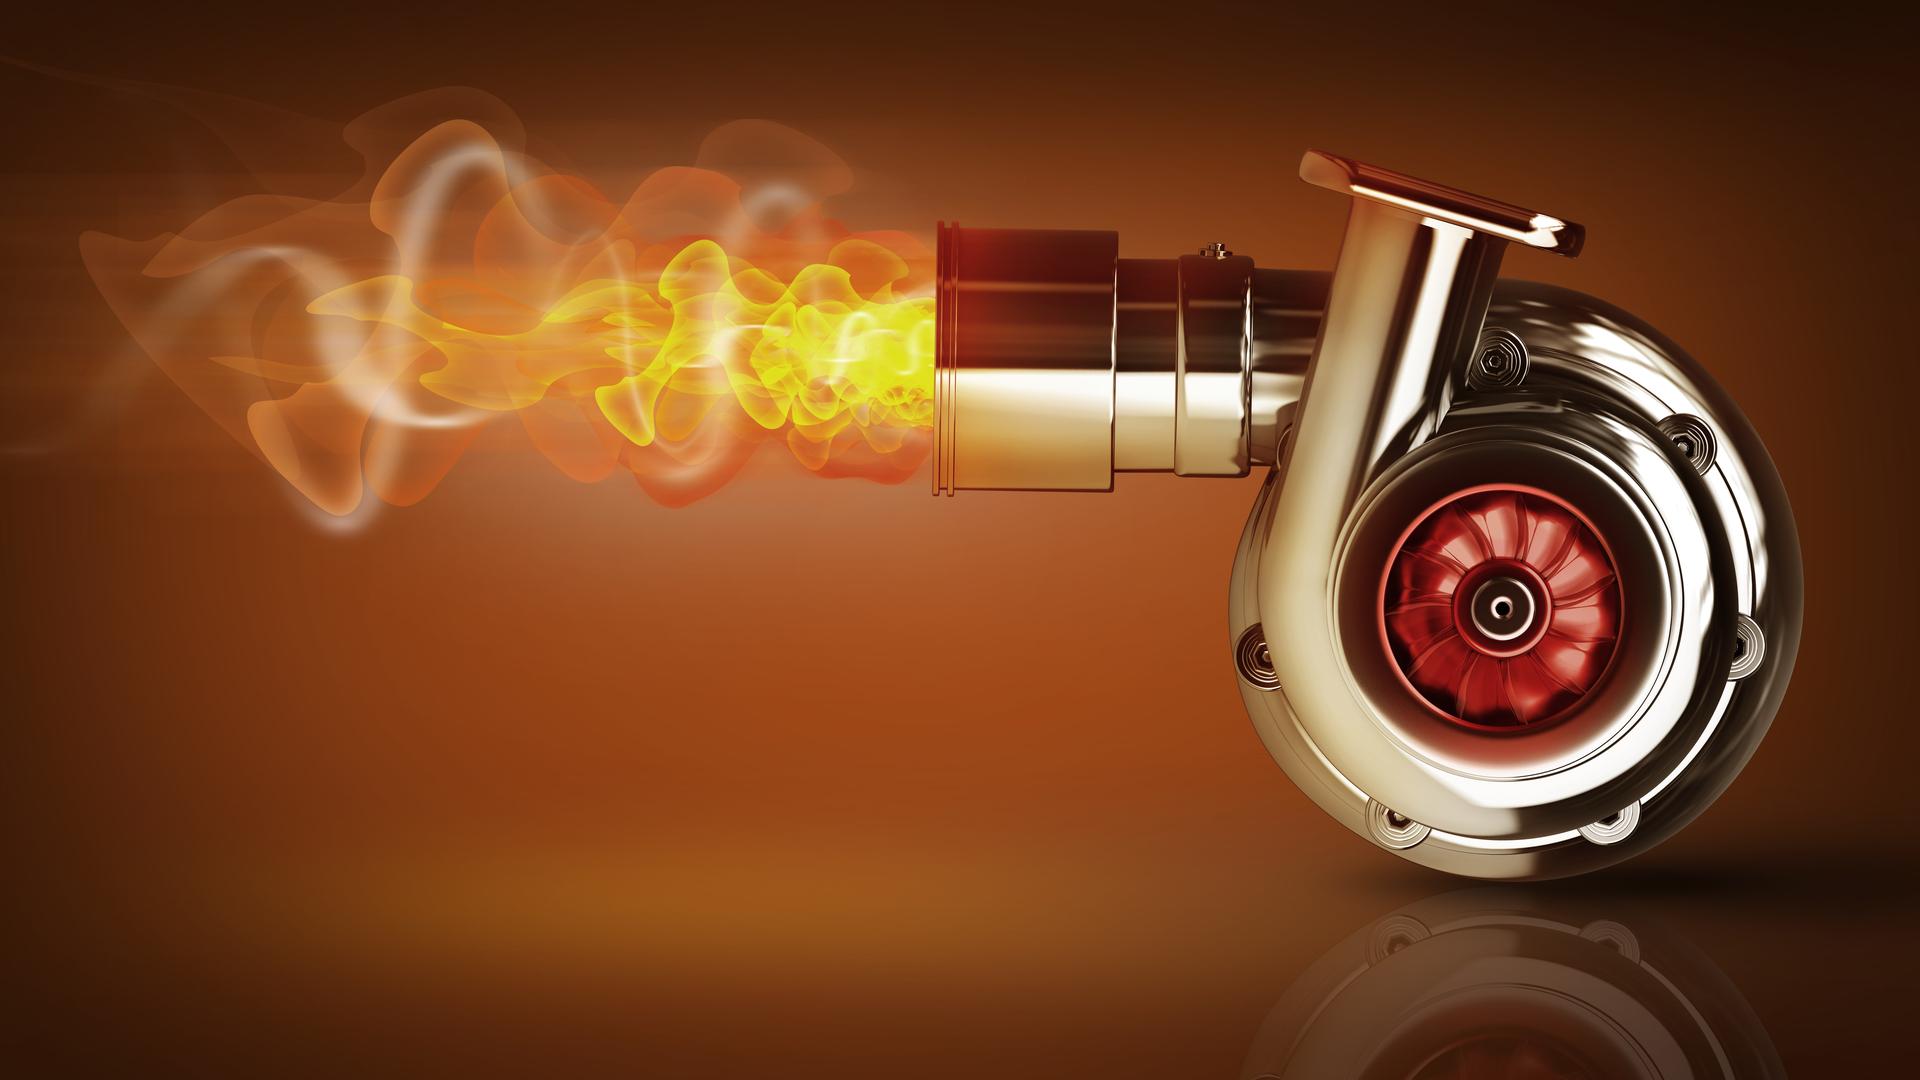 motor turbo carro turbina shutterstock 152818436